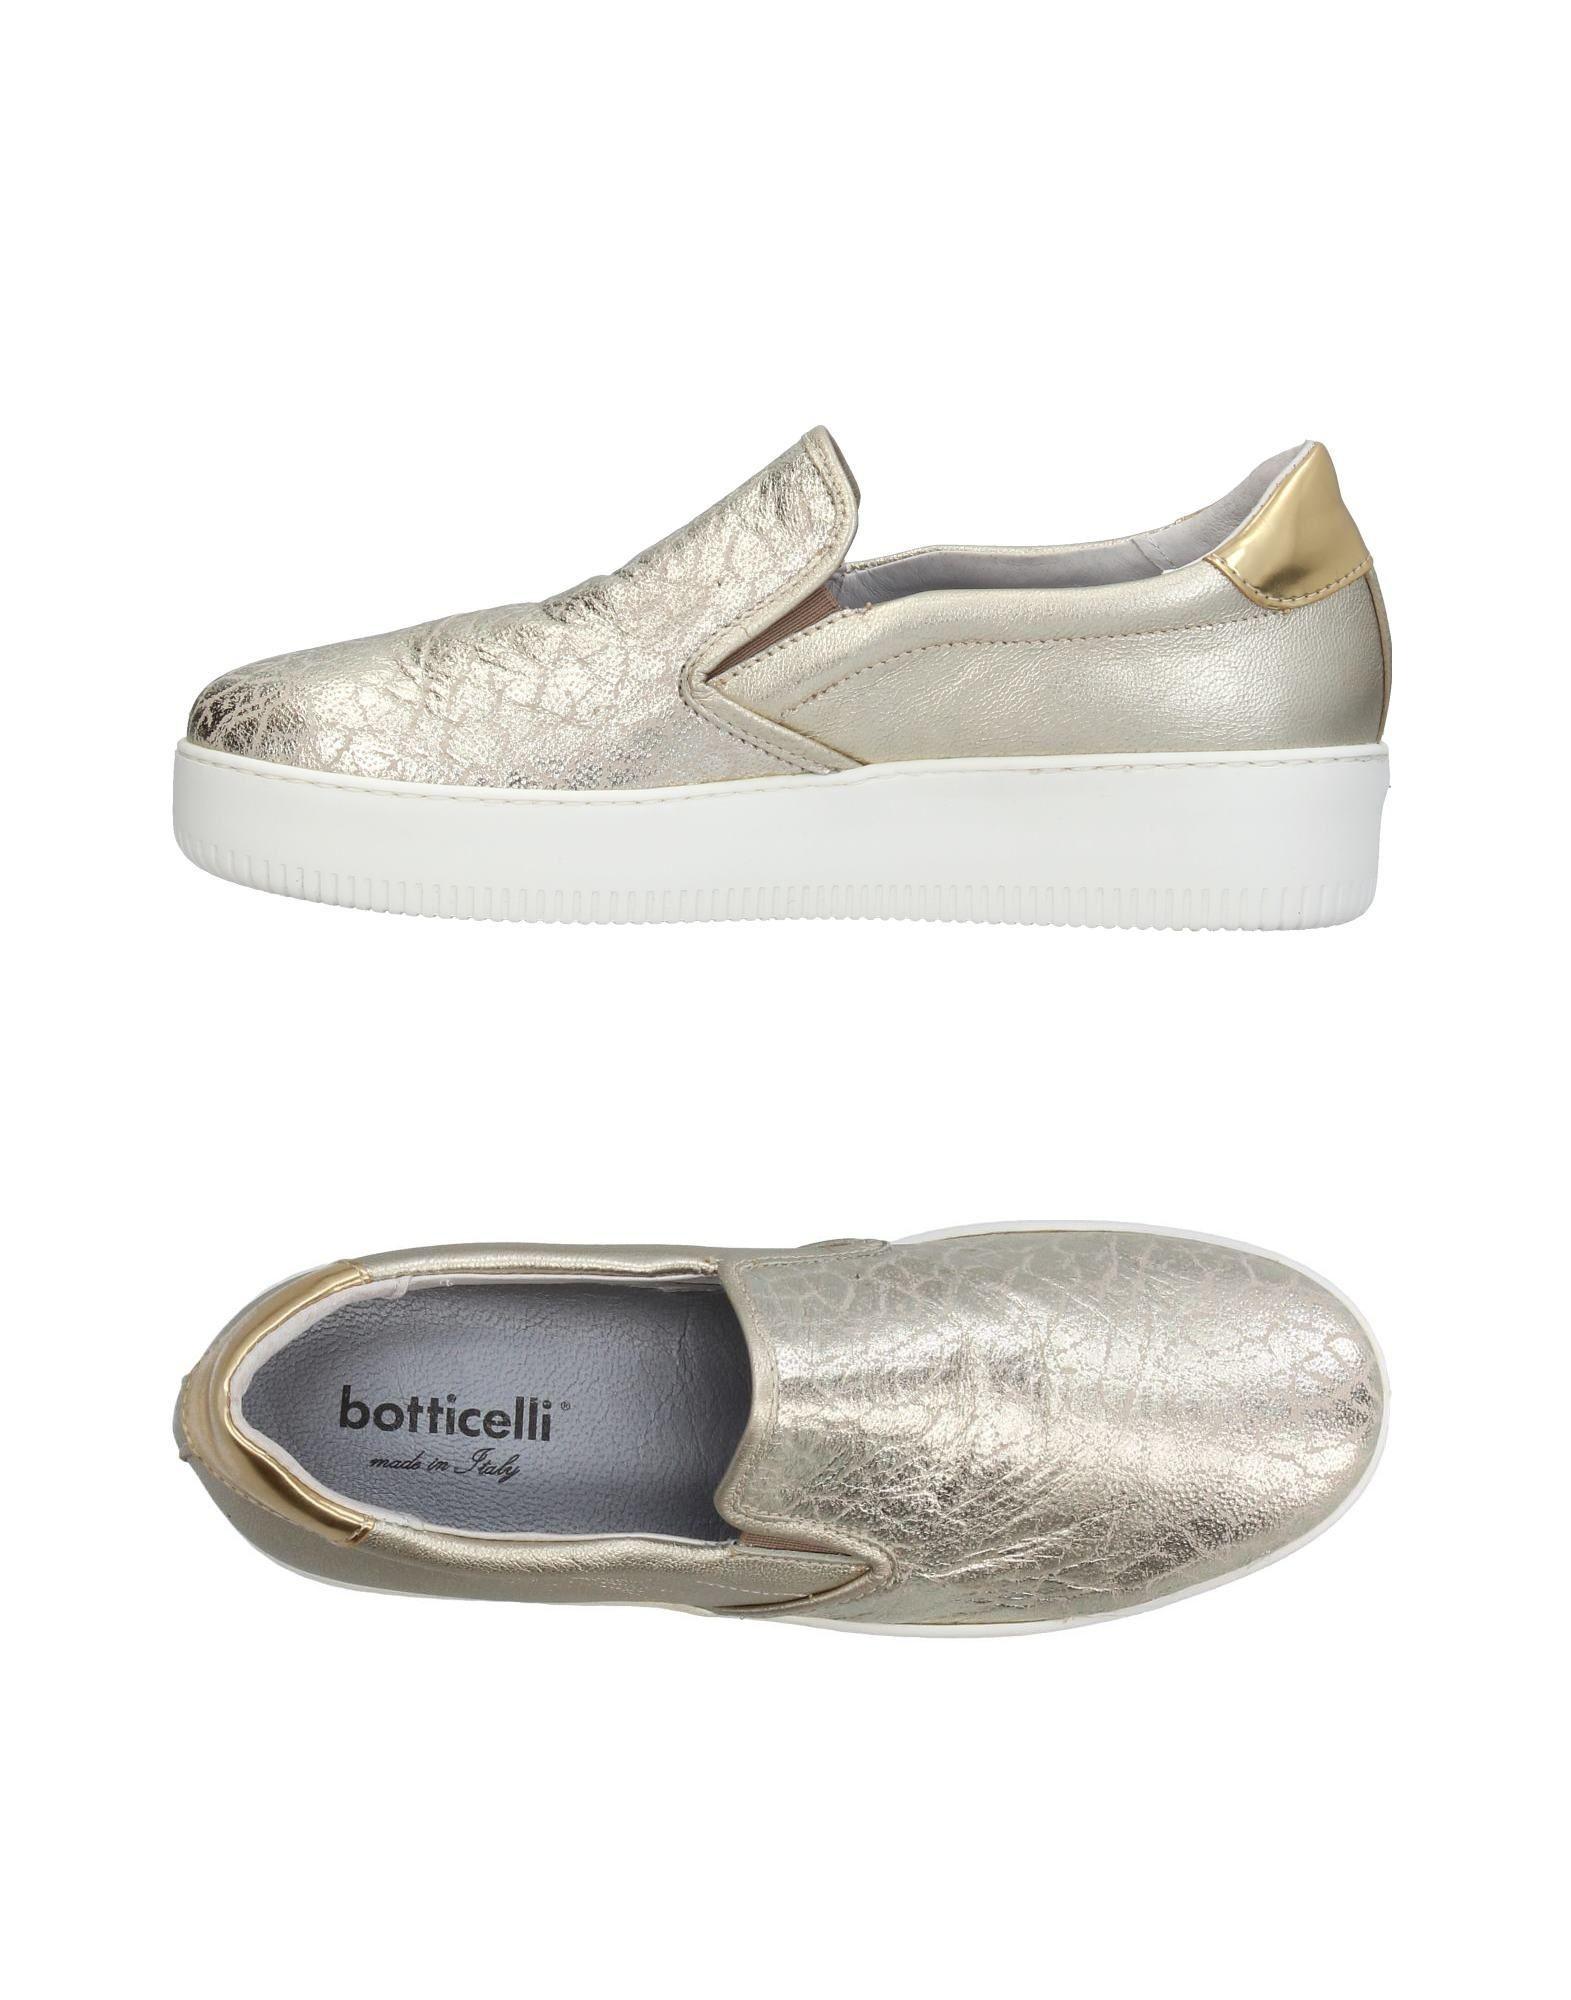 ROBERTO BOTTICELLI Низкие кеды и кроссовки botticelli низкие кеды и кроссовки